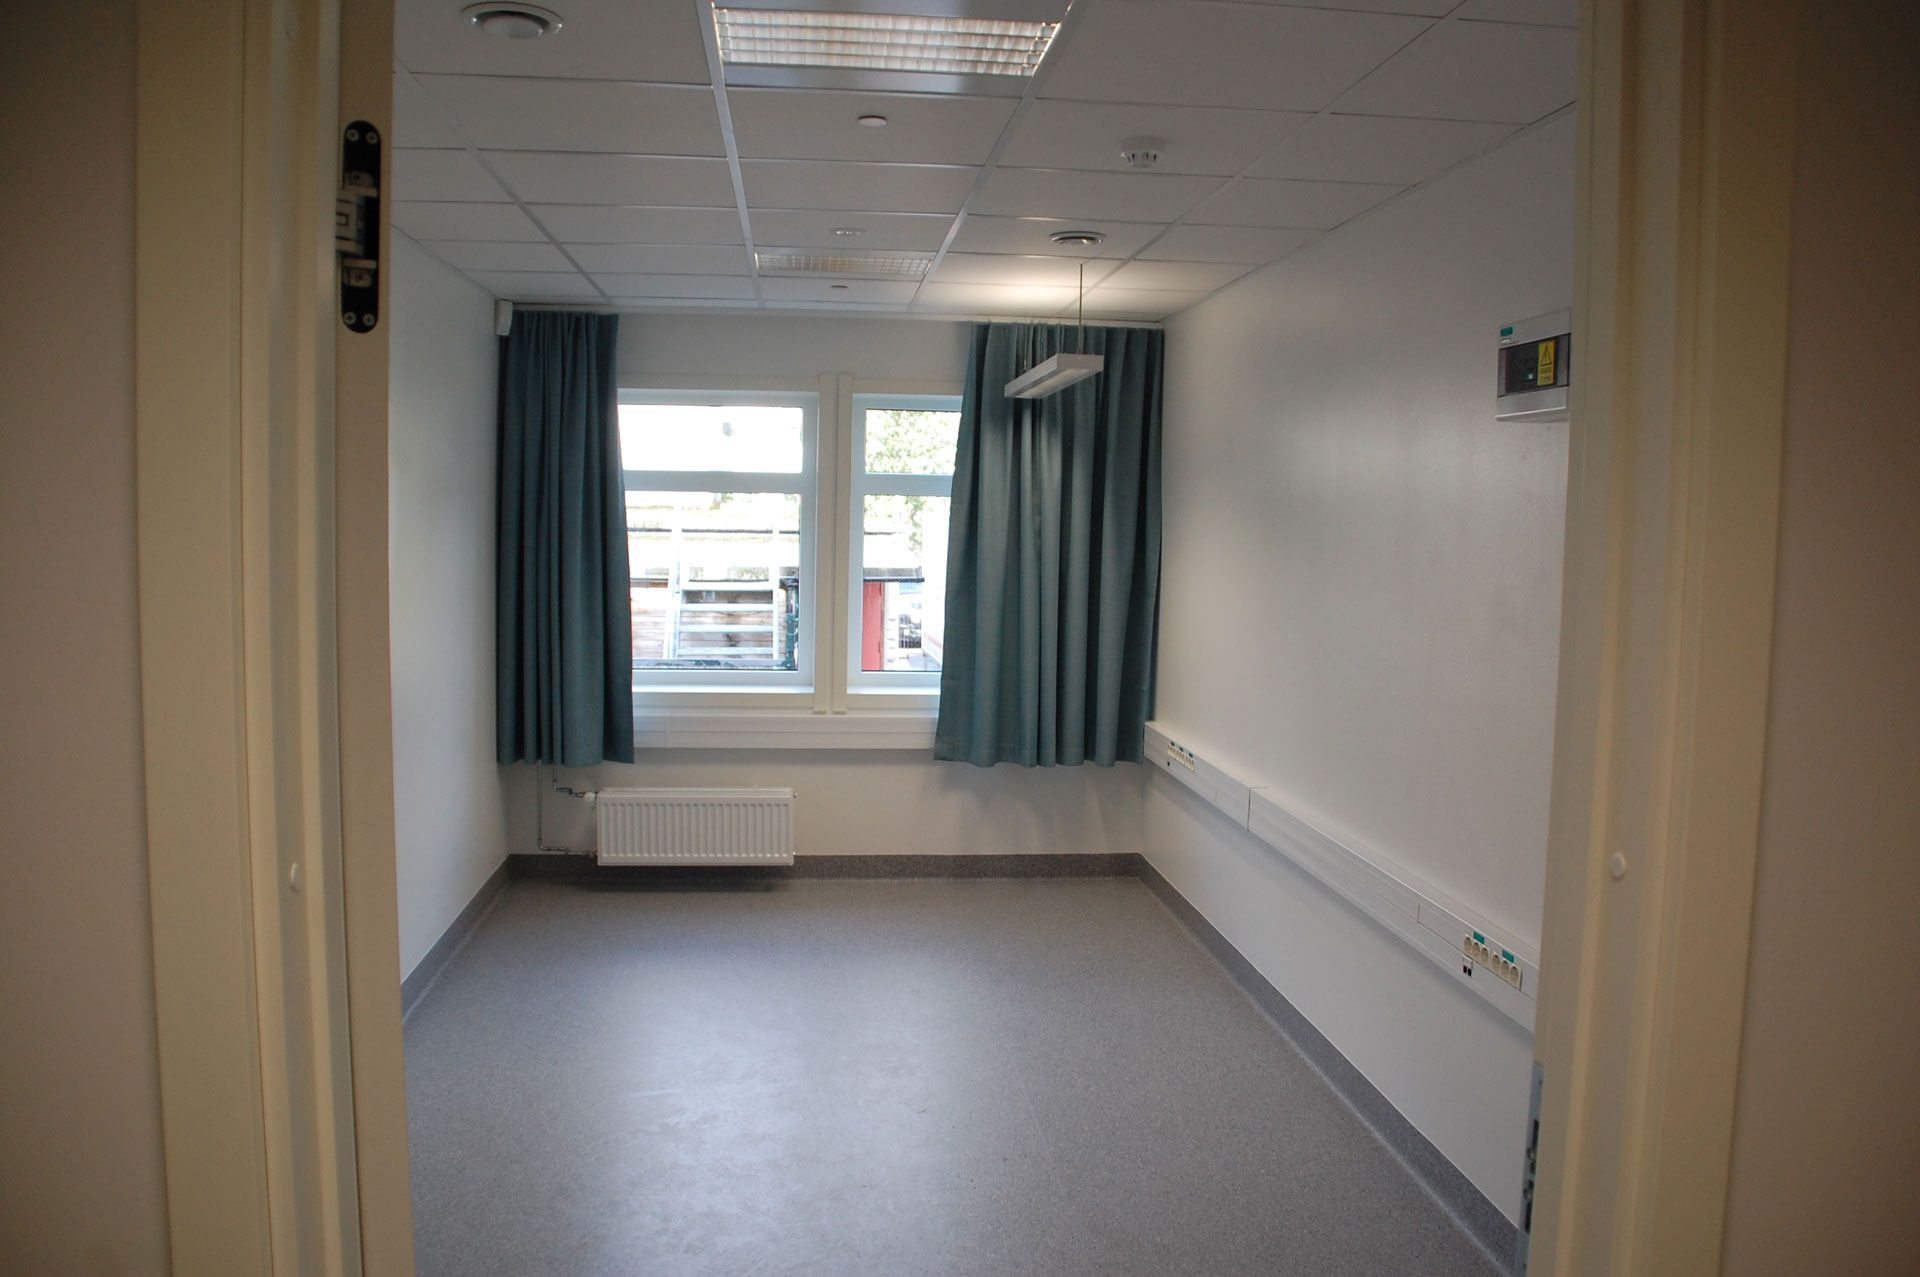 sykehus kontor innvendig